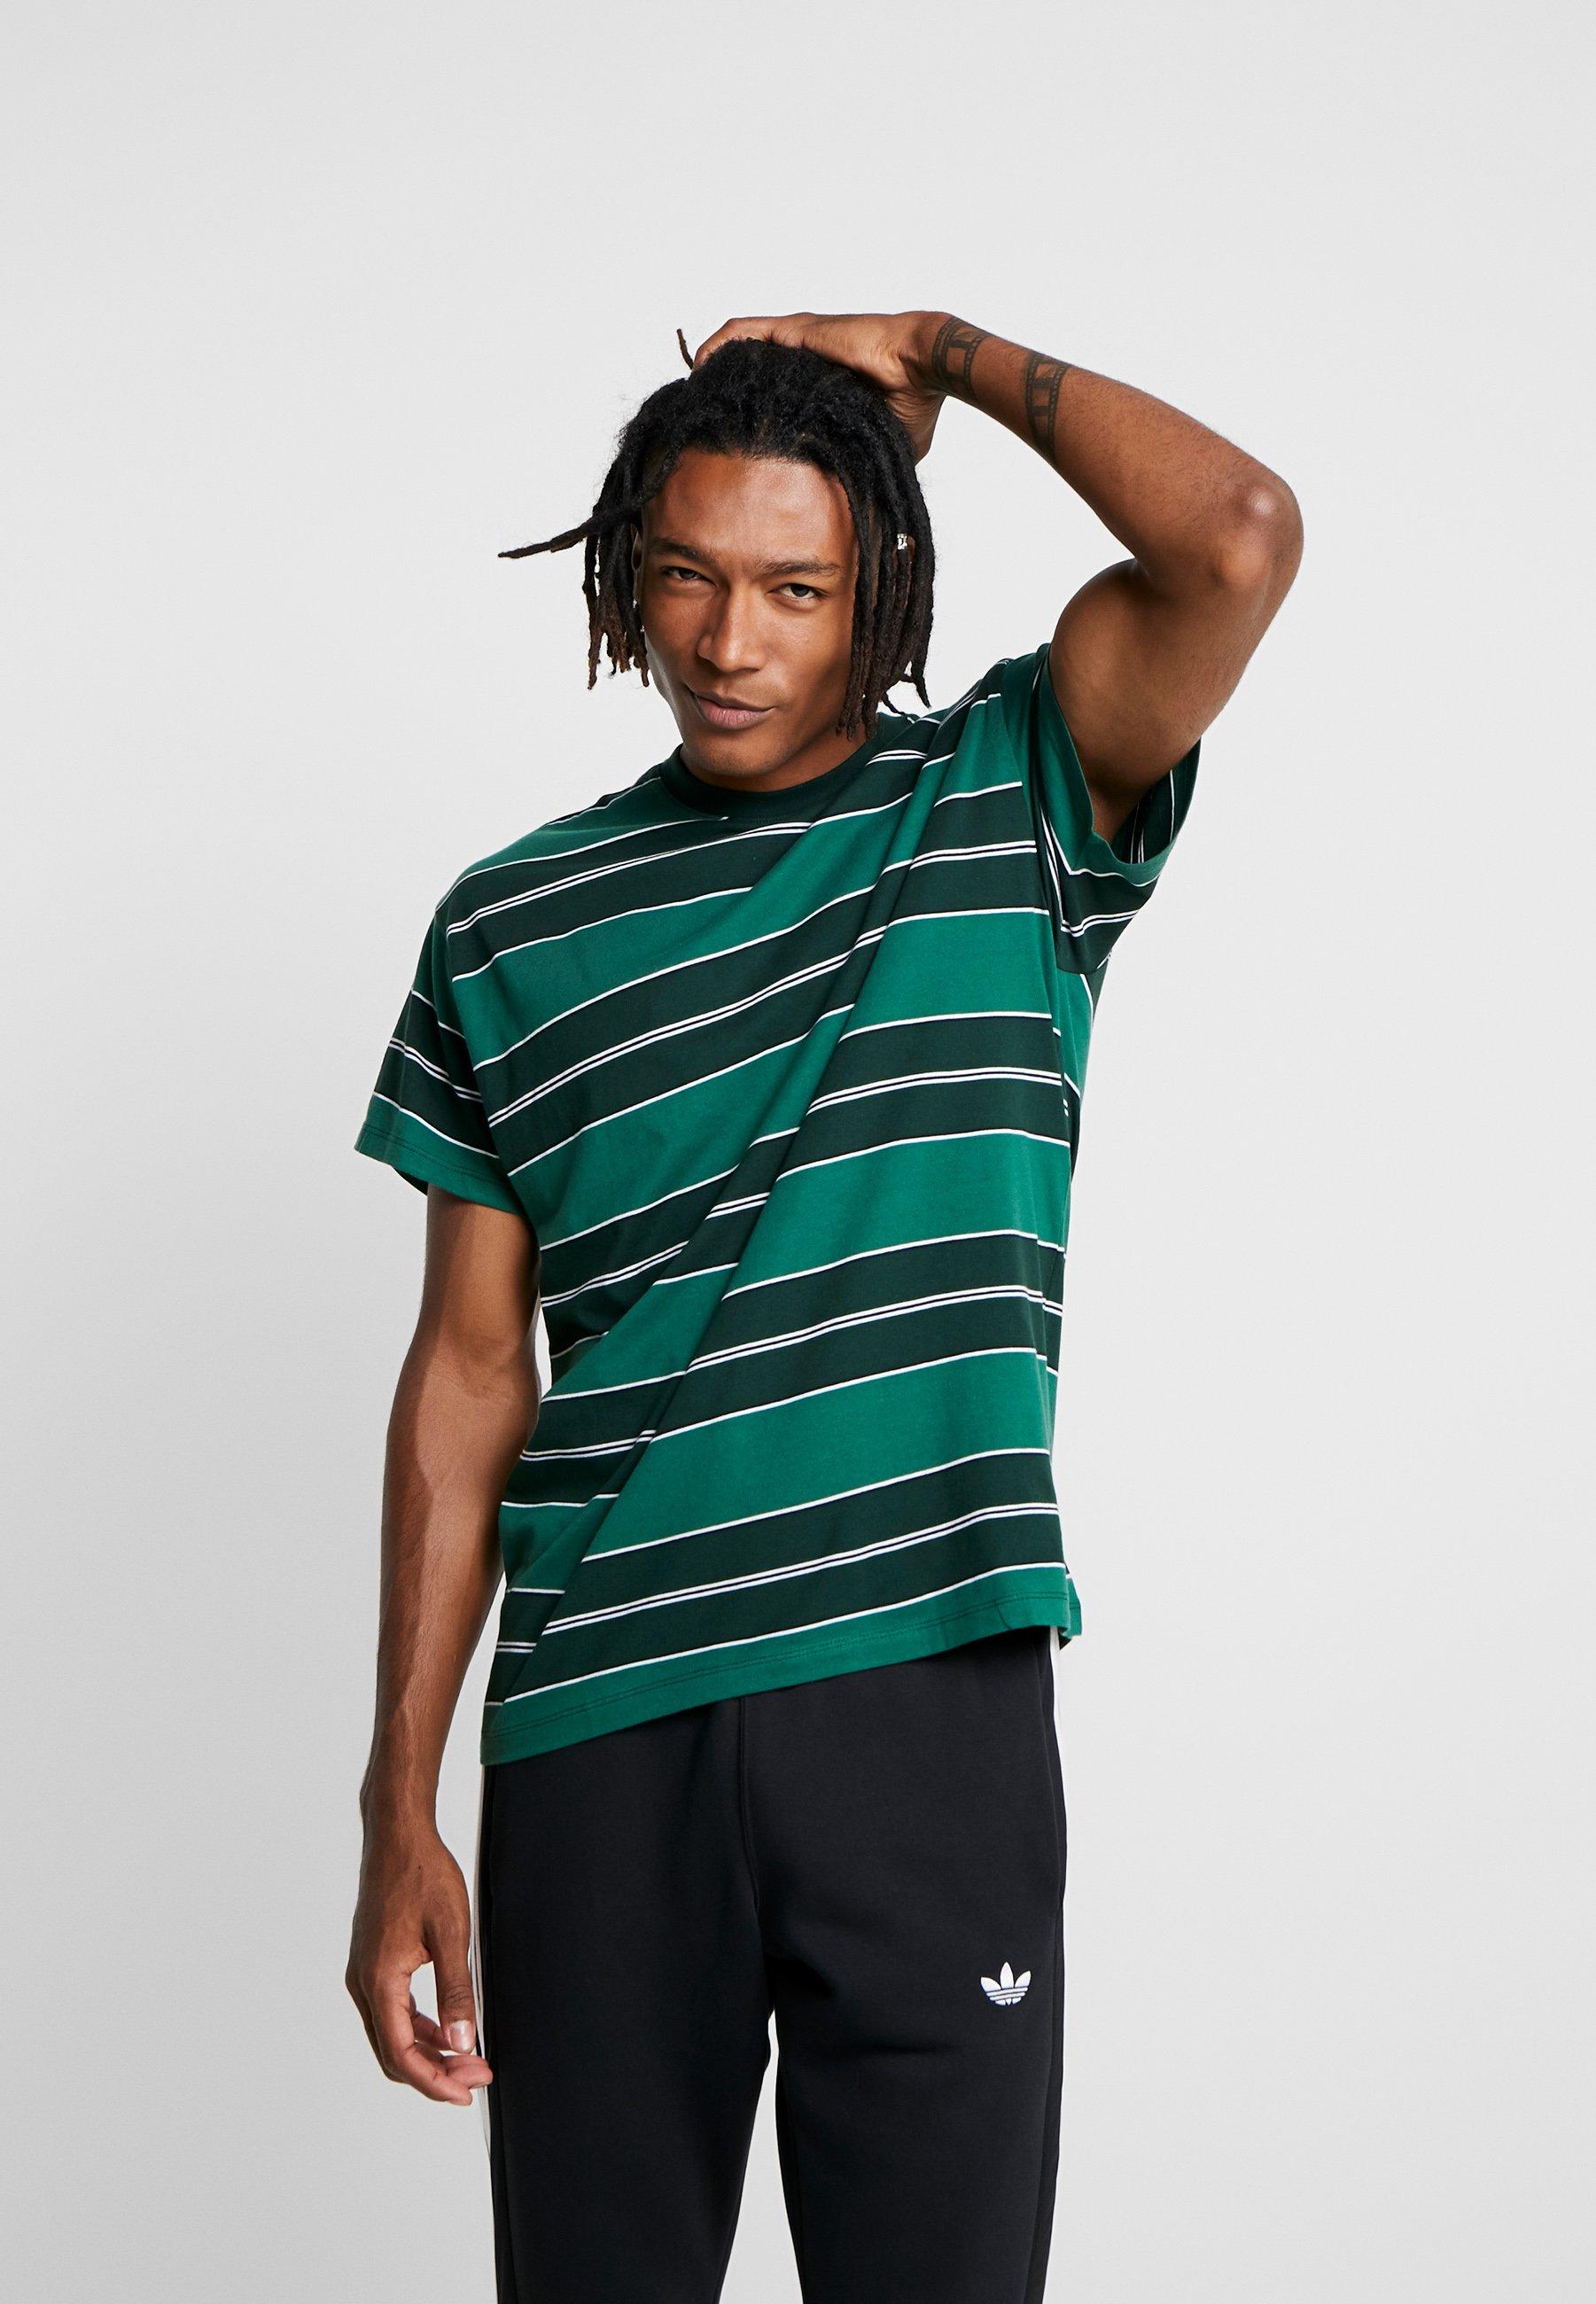 Look New Green Filey Stripe TeeT shirt Imprimé bYyIf67gvm